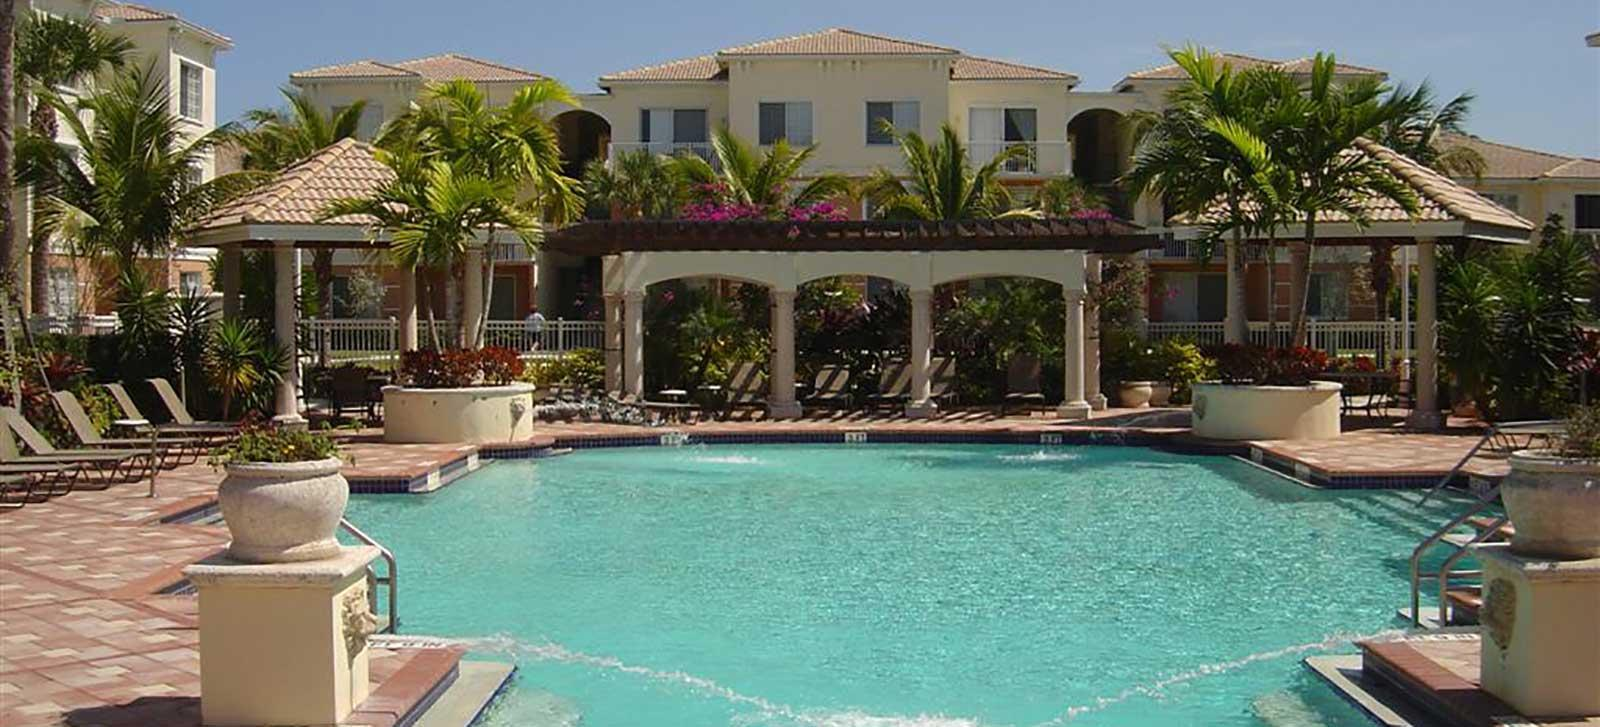 fiore condos for sale palm beach gardens real estate